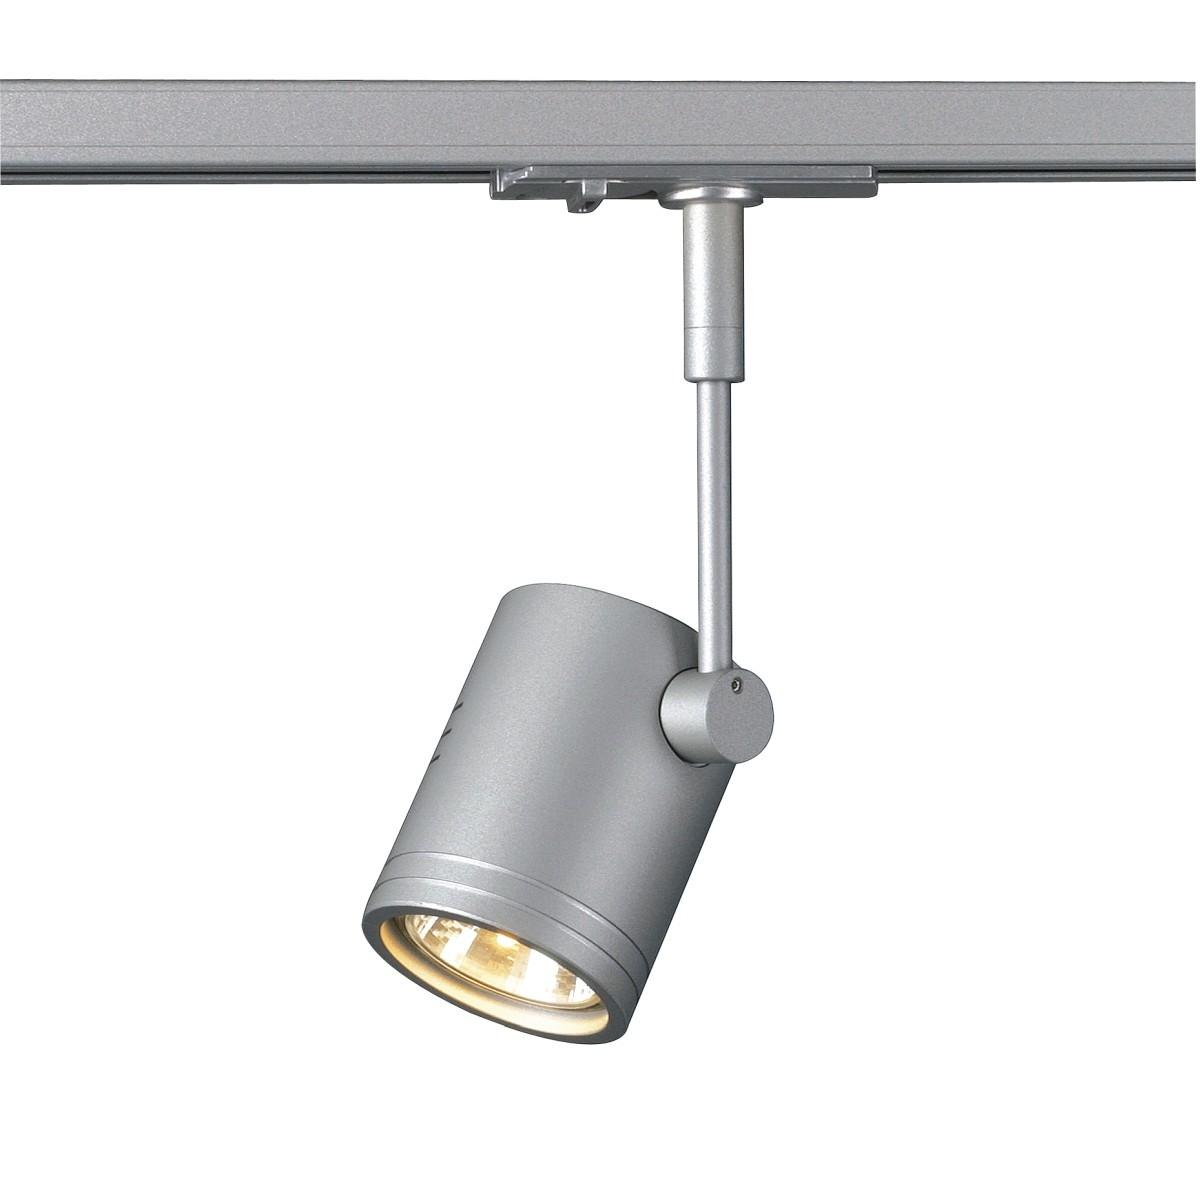 SPOTLINE/SLV BIMA I.1-fazowa Adapter SrebrnoSzary. GU10. max. 50W. 143442 Reflektor